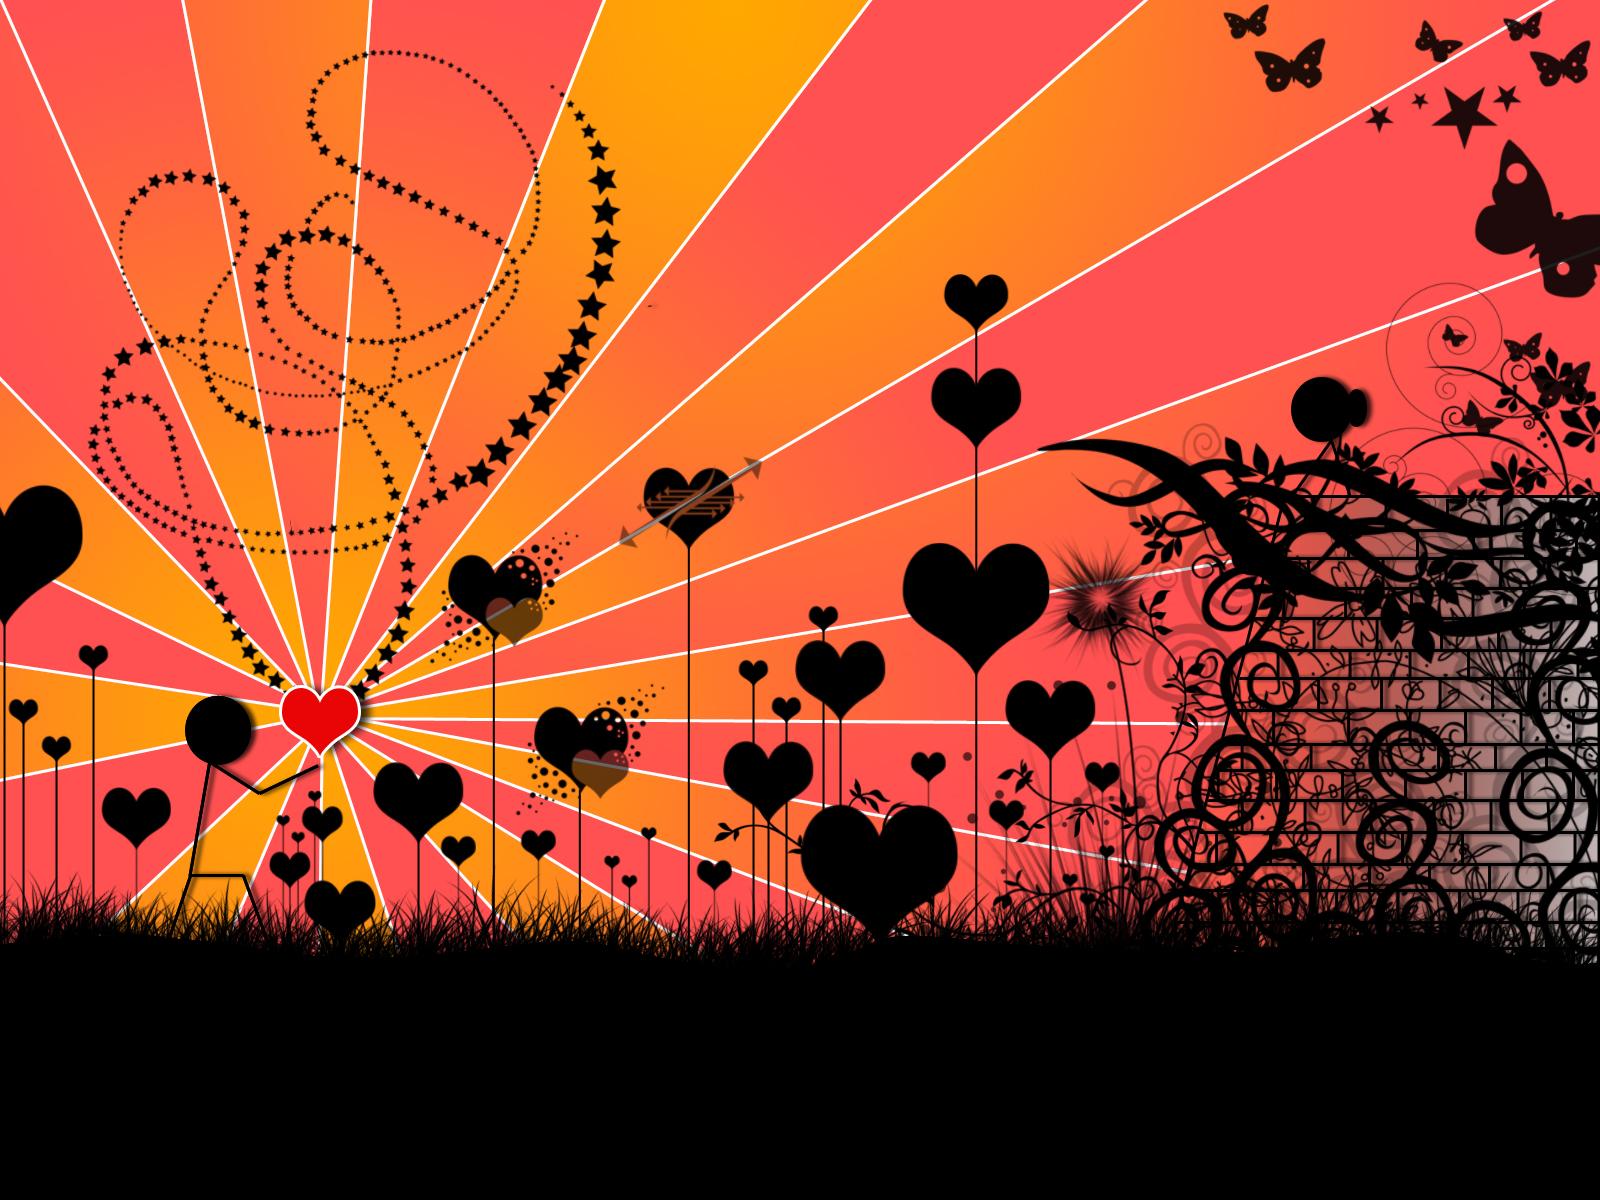 http://1.bp.blogspot.com/-RVf8qsG13So/UPba54_9fdI/AAAAAAAAAa0/4B0zZbXbi0A/s1600/can__t_help_falling_in_love_by_deeo_elaclaire-d1iu6w6.jpg